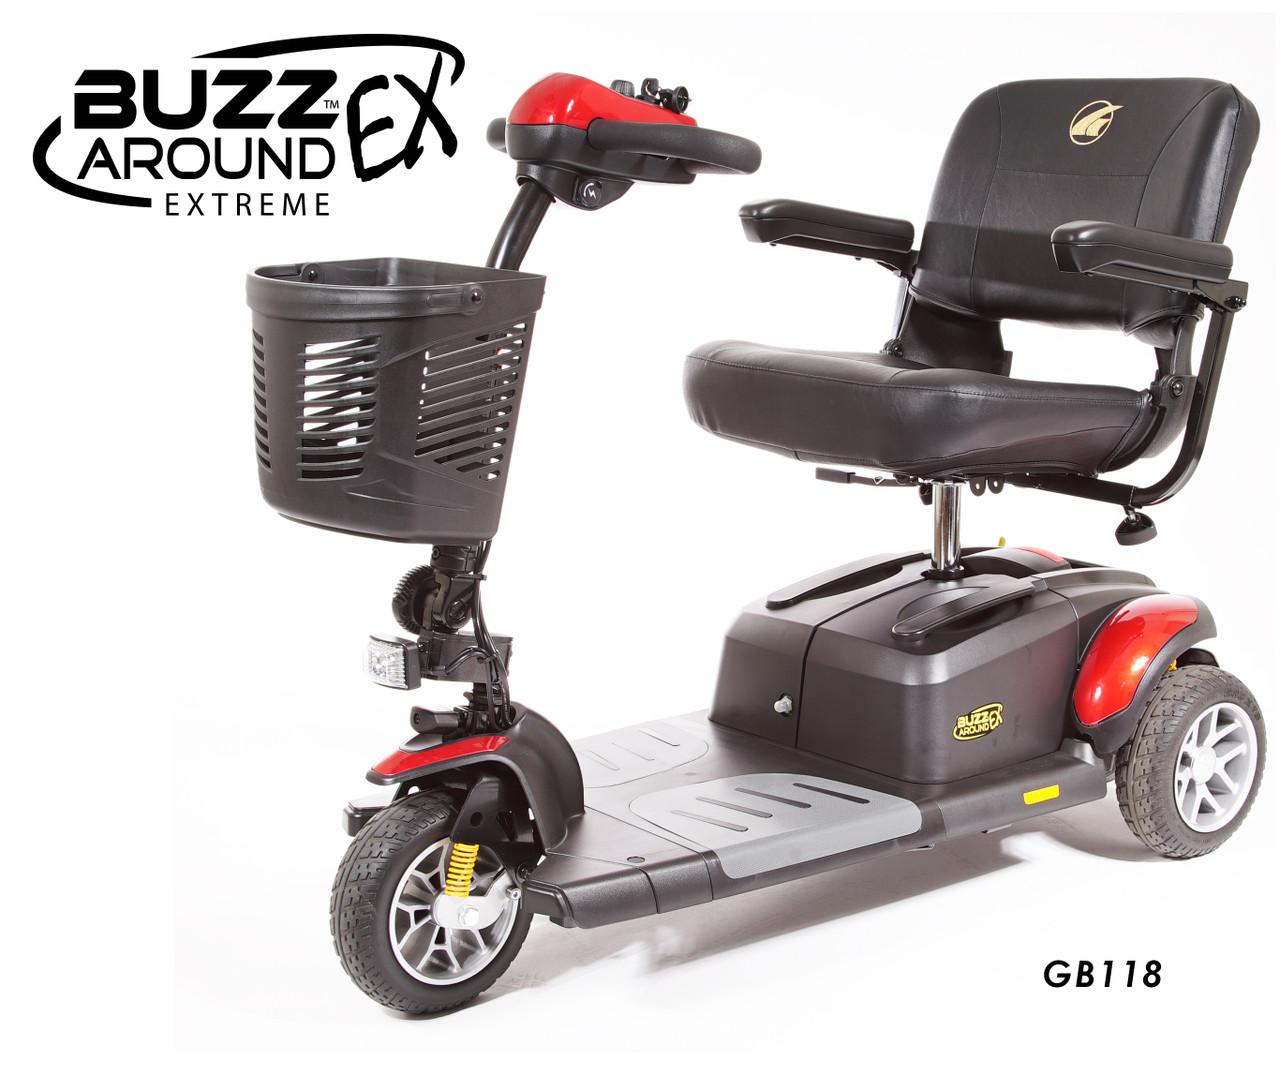 Buzzaround EX Extreme 3-Wheel Scooter